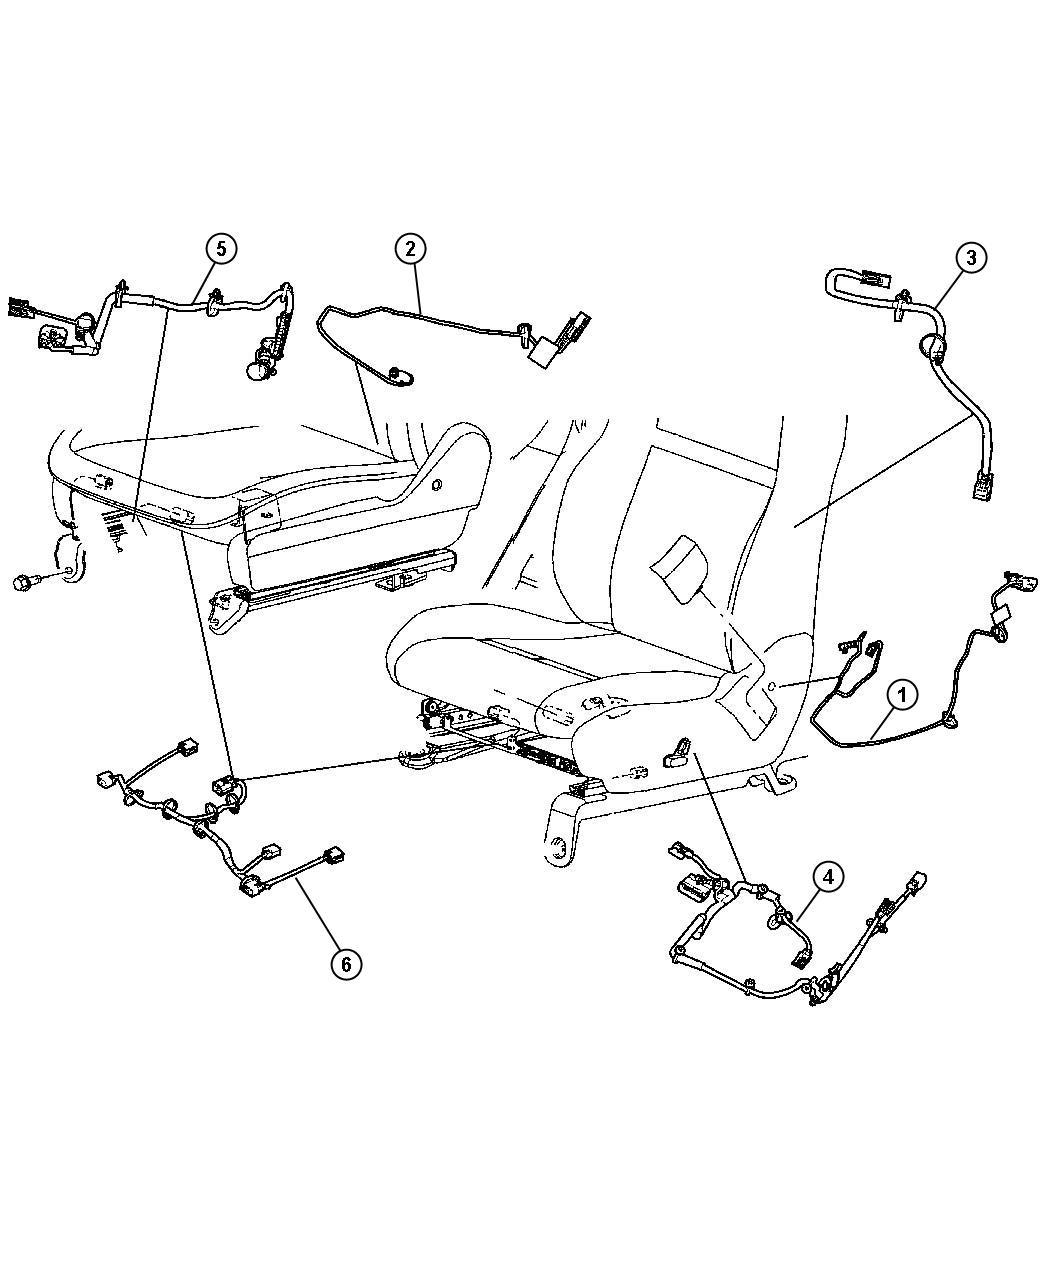 Jeep Grand Cherokee Wiring. Power seat. Active head